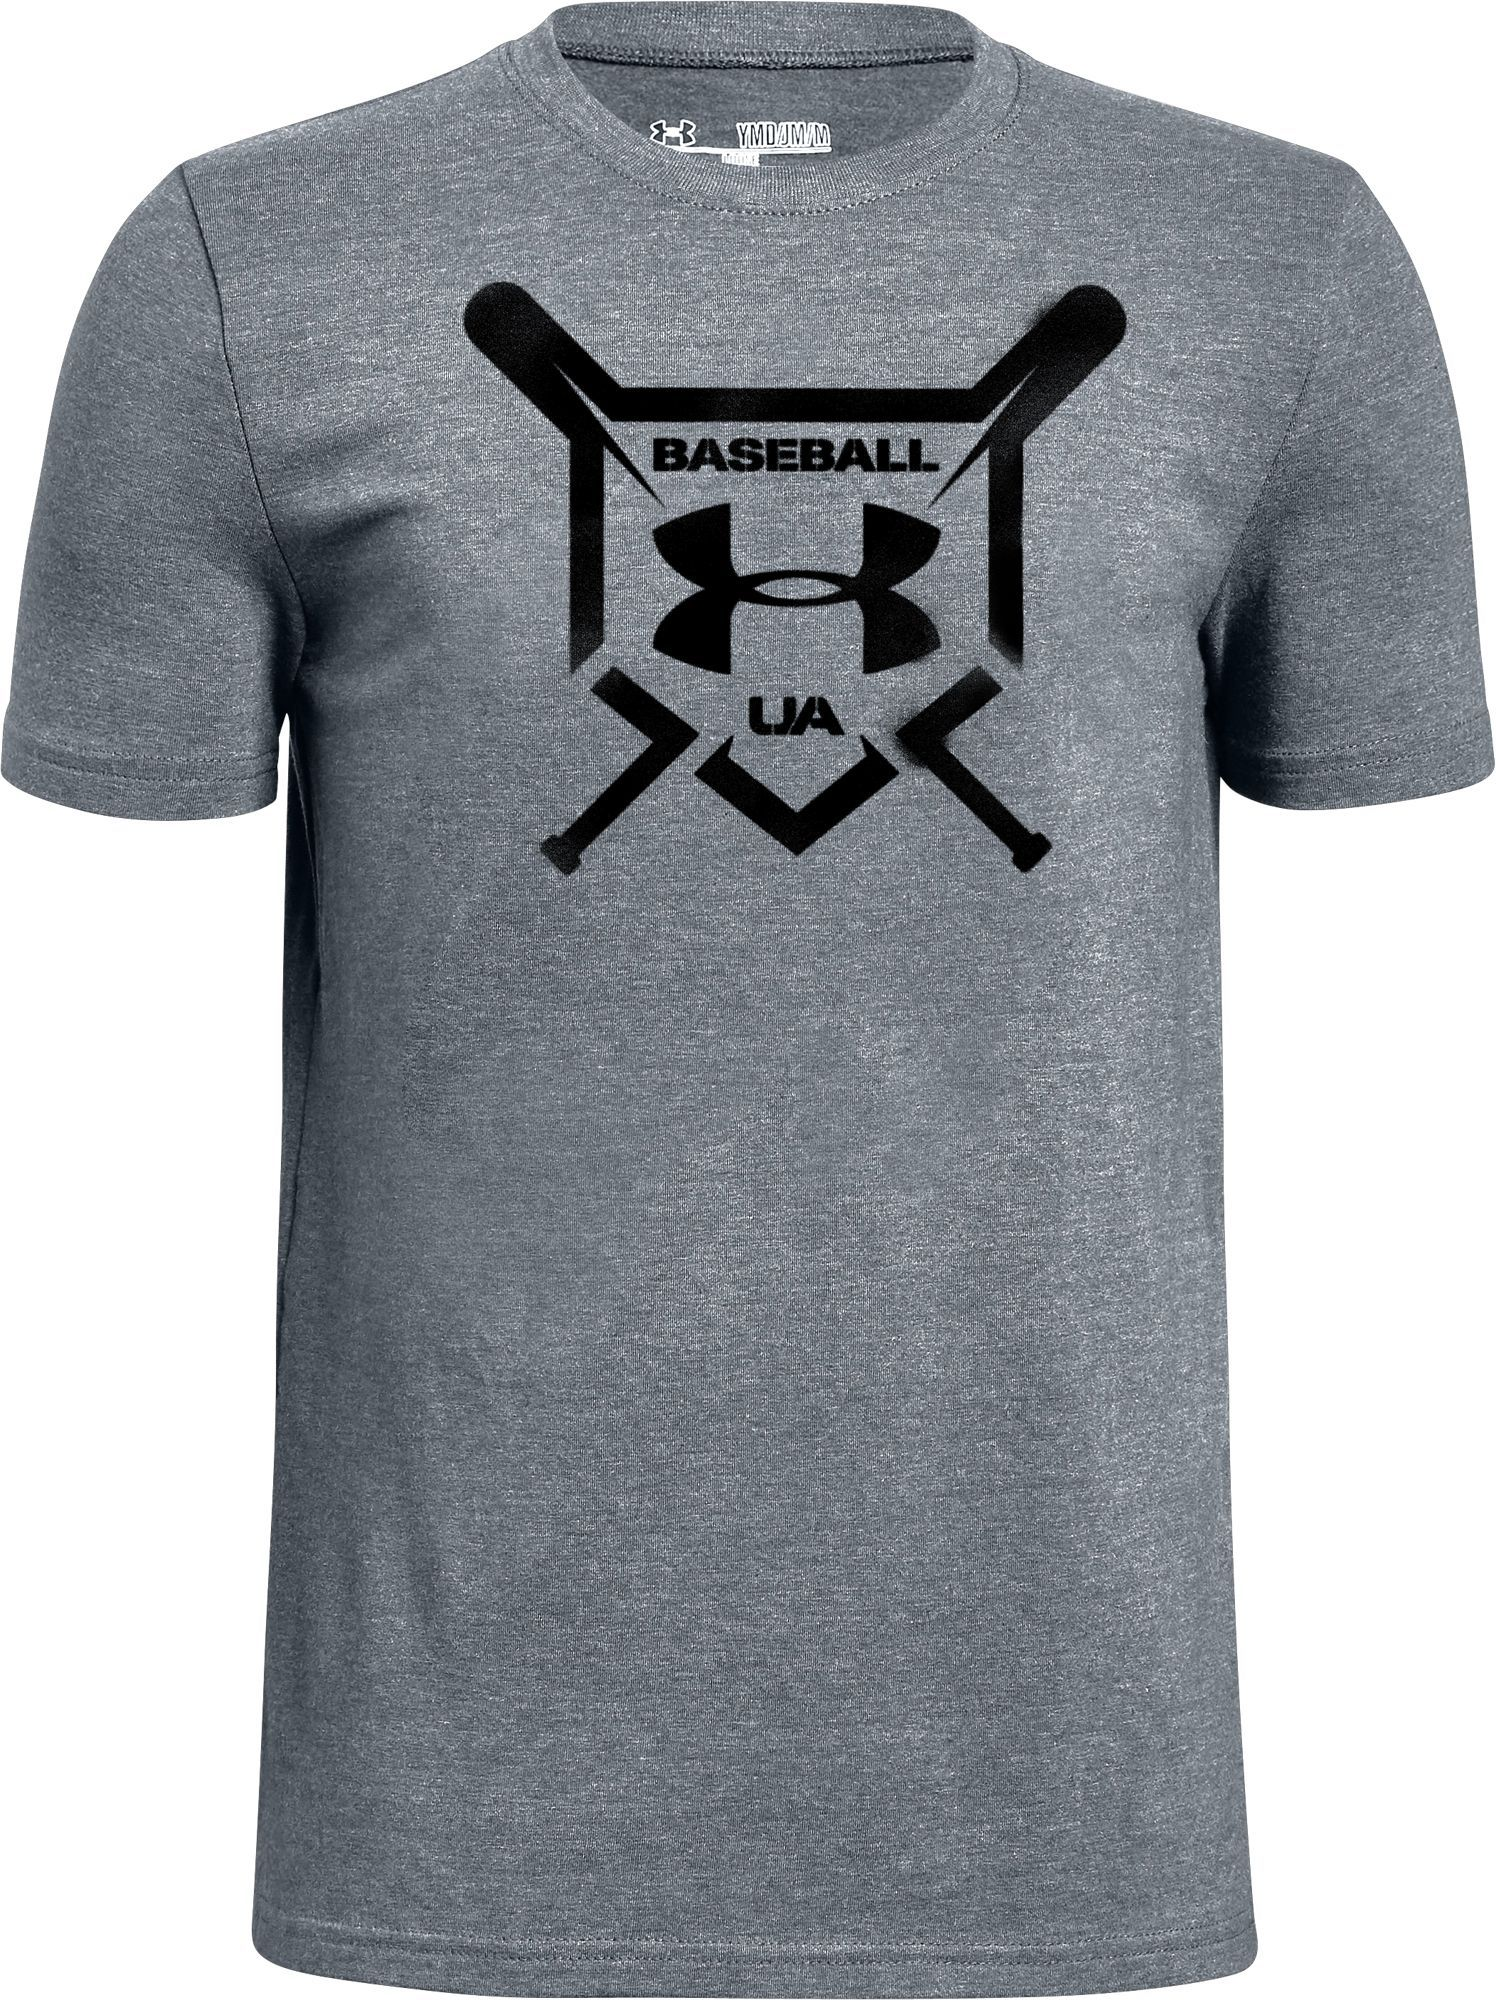 fa0ecad2 Under Armour Boys' Baseball Squad Graphic T-Shirt, Size: Medium, Gray